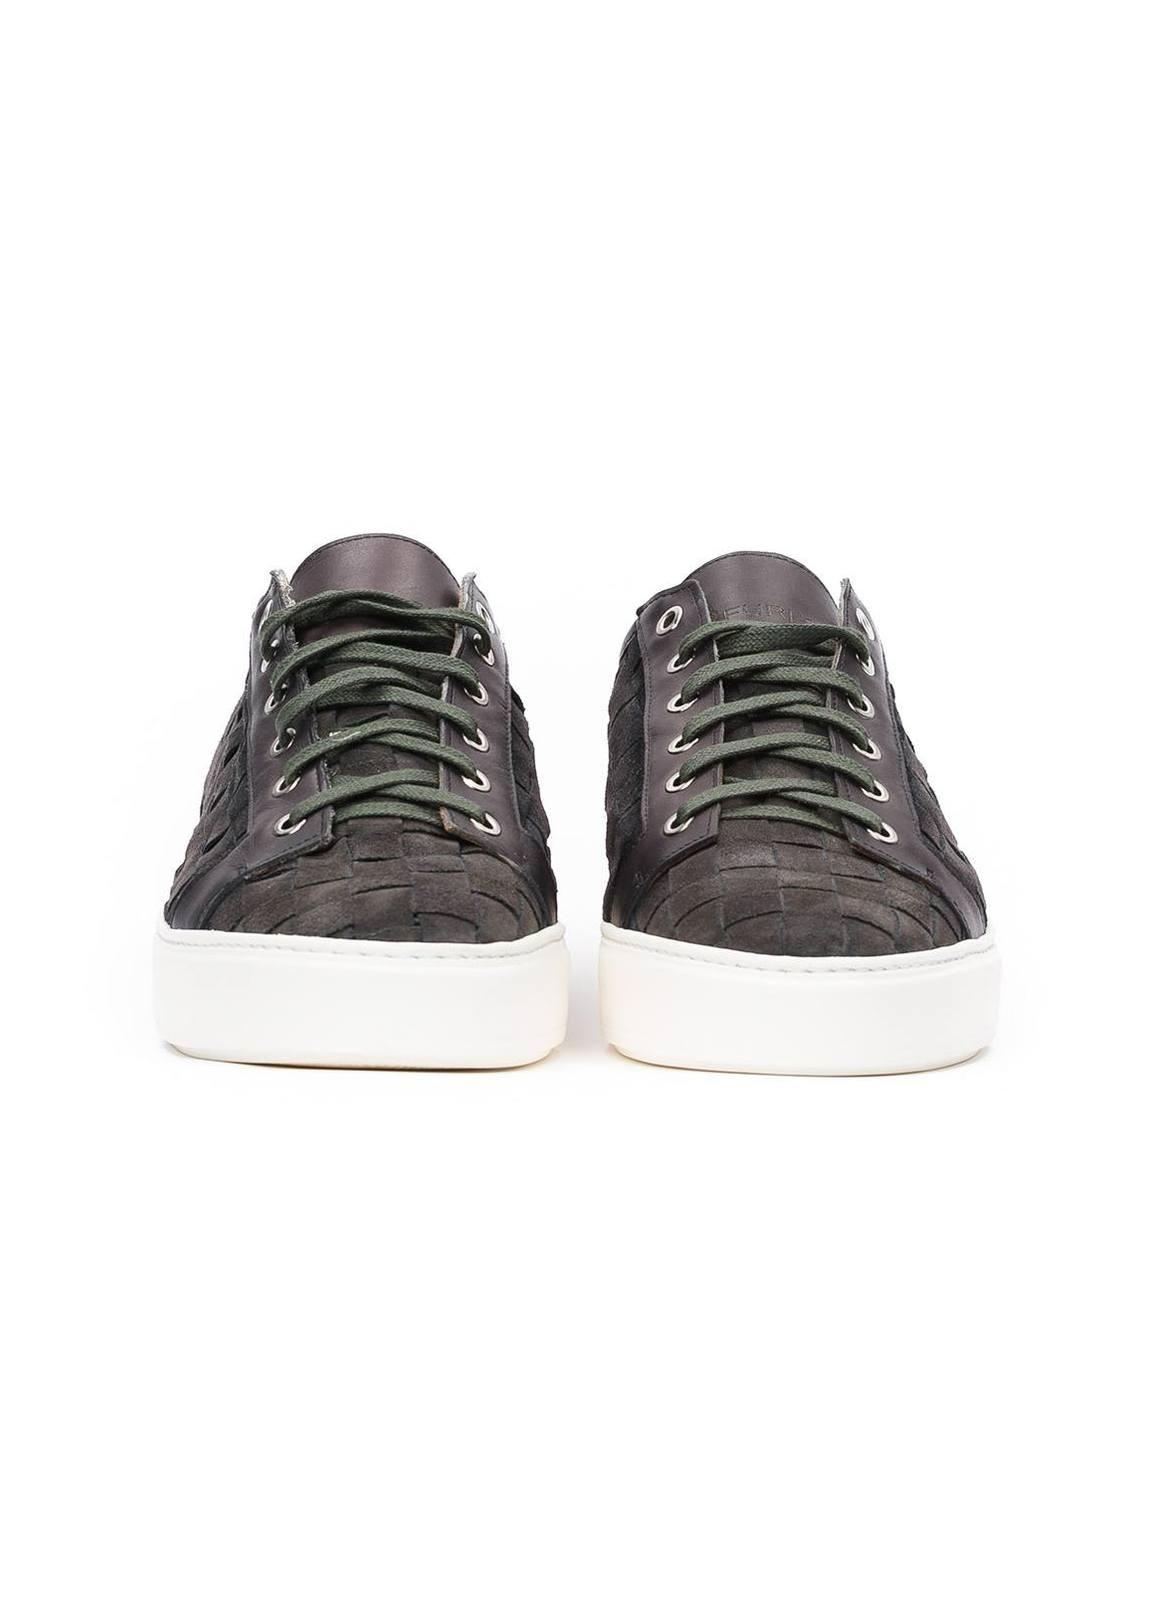 Zapato Sport Wear color gris, 100% Serraje. - Ítem2